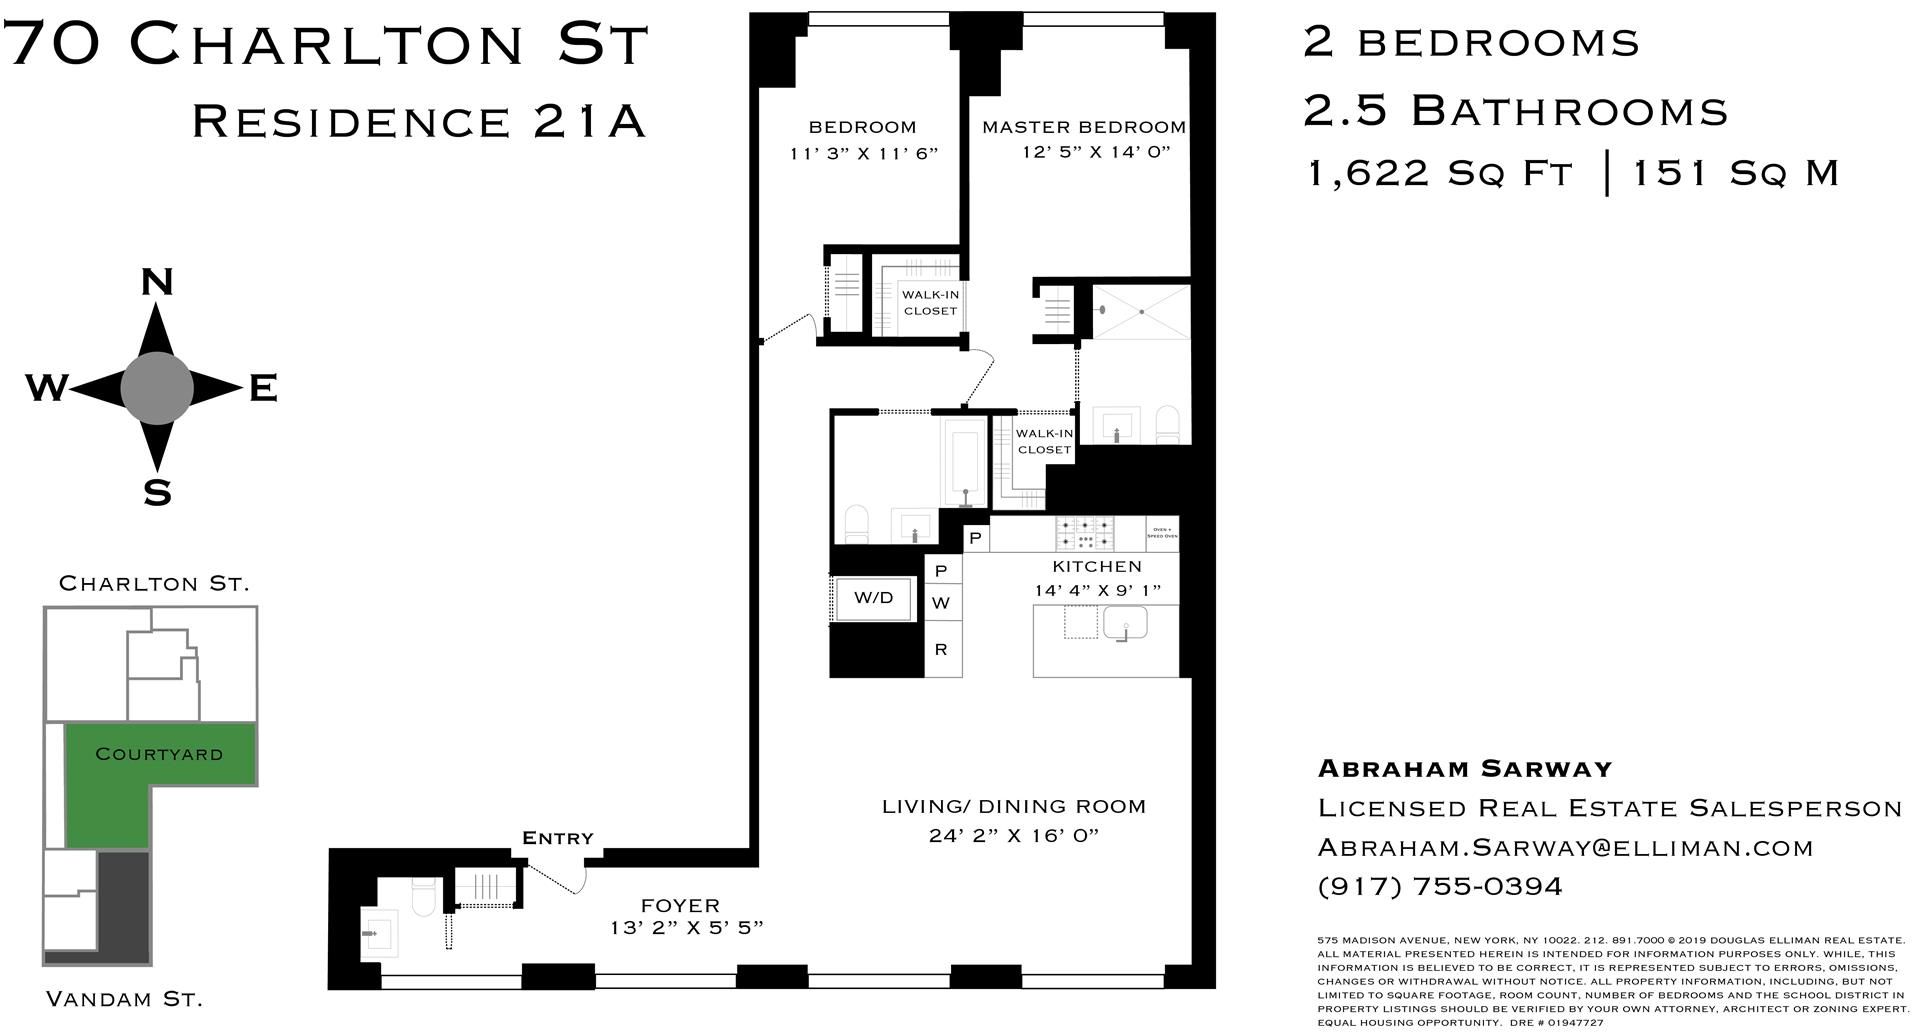 Floor plan of 70 Charlton Street, 21A - SoHo - Nolita, New York